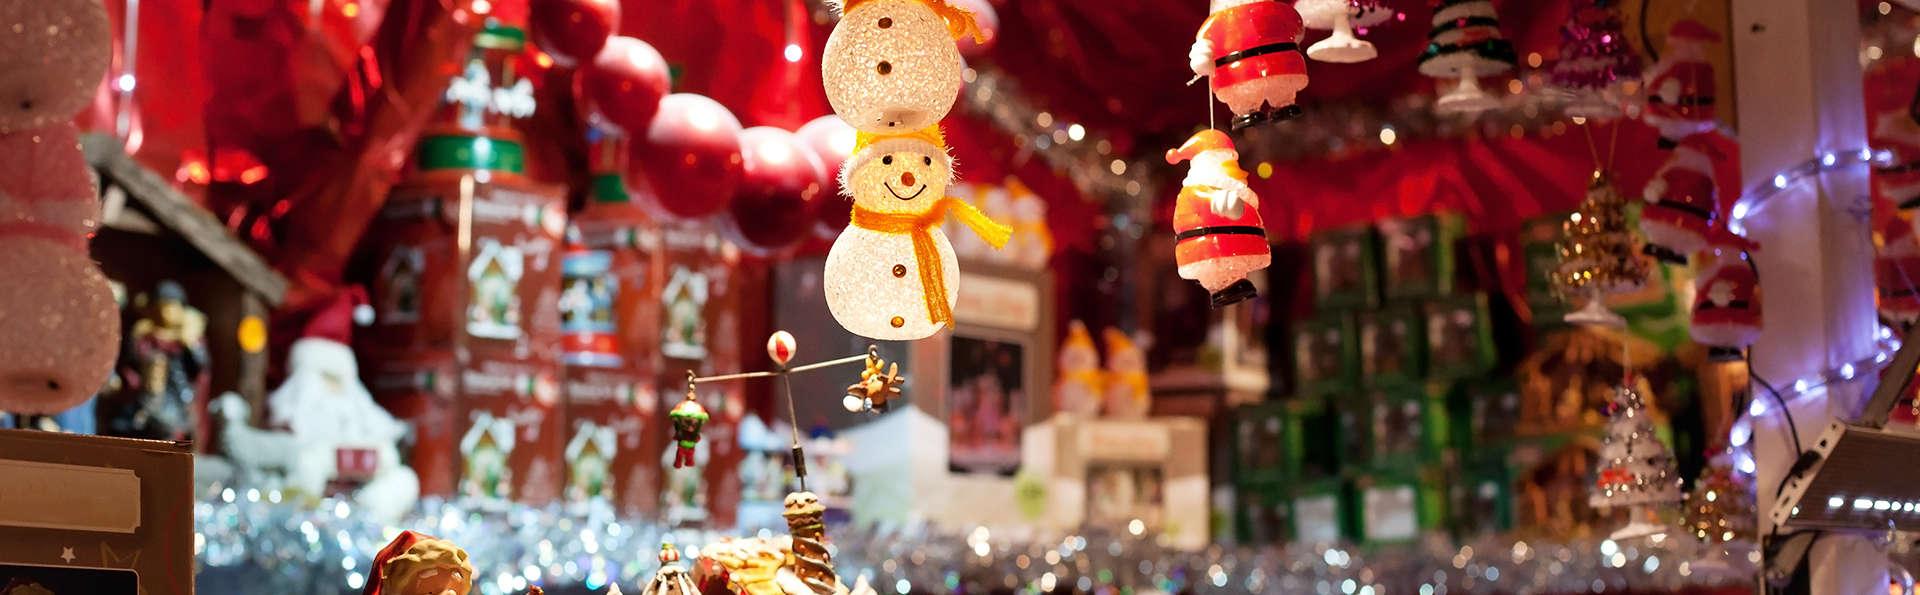 Un Noël féerique en Alsace